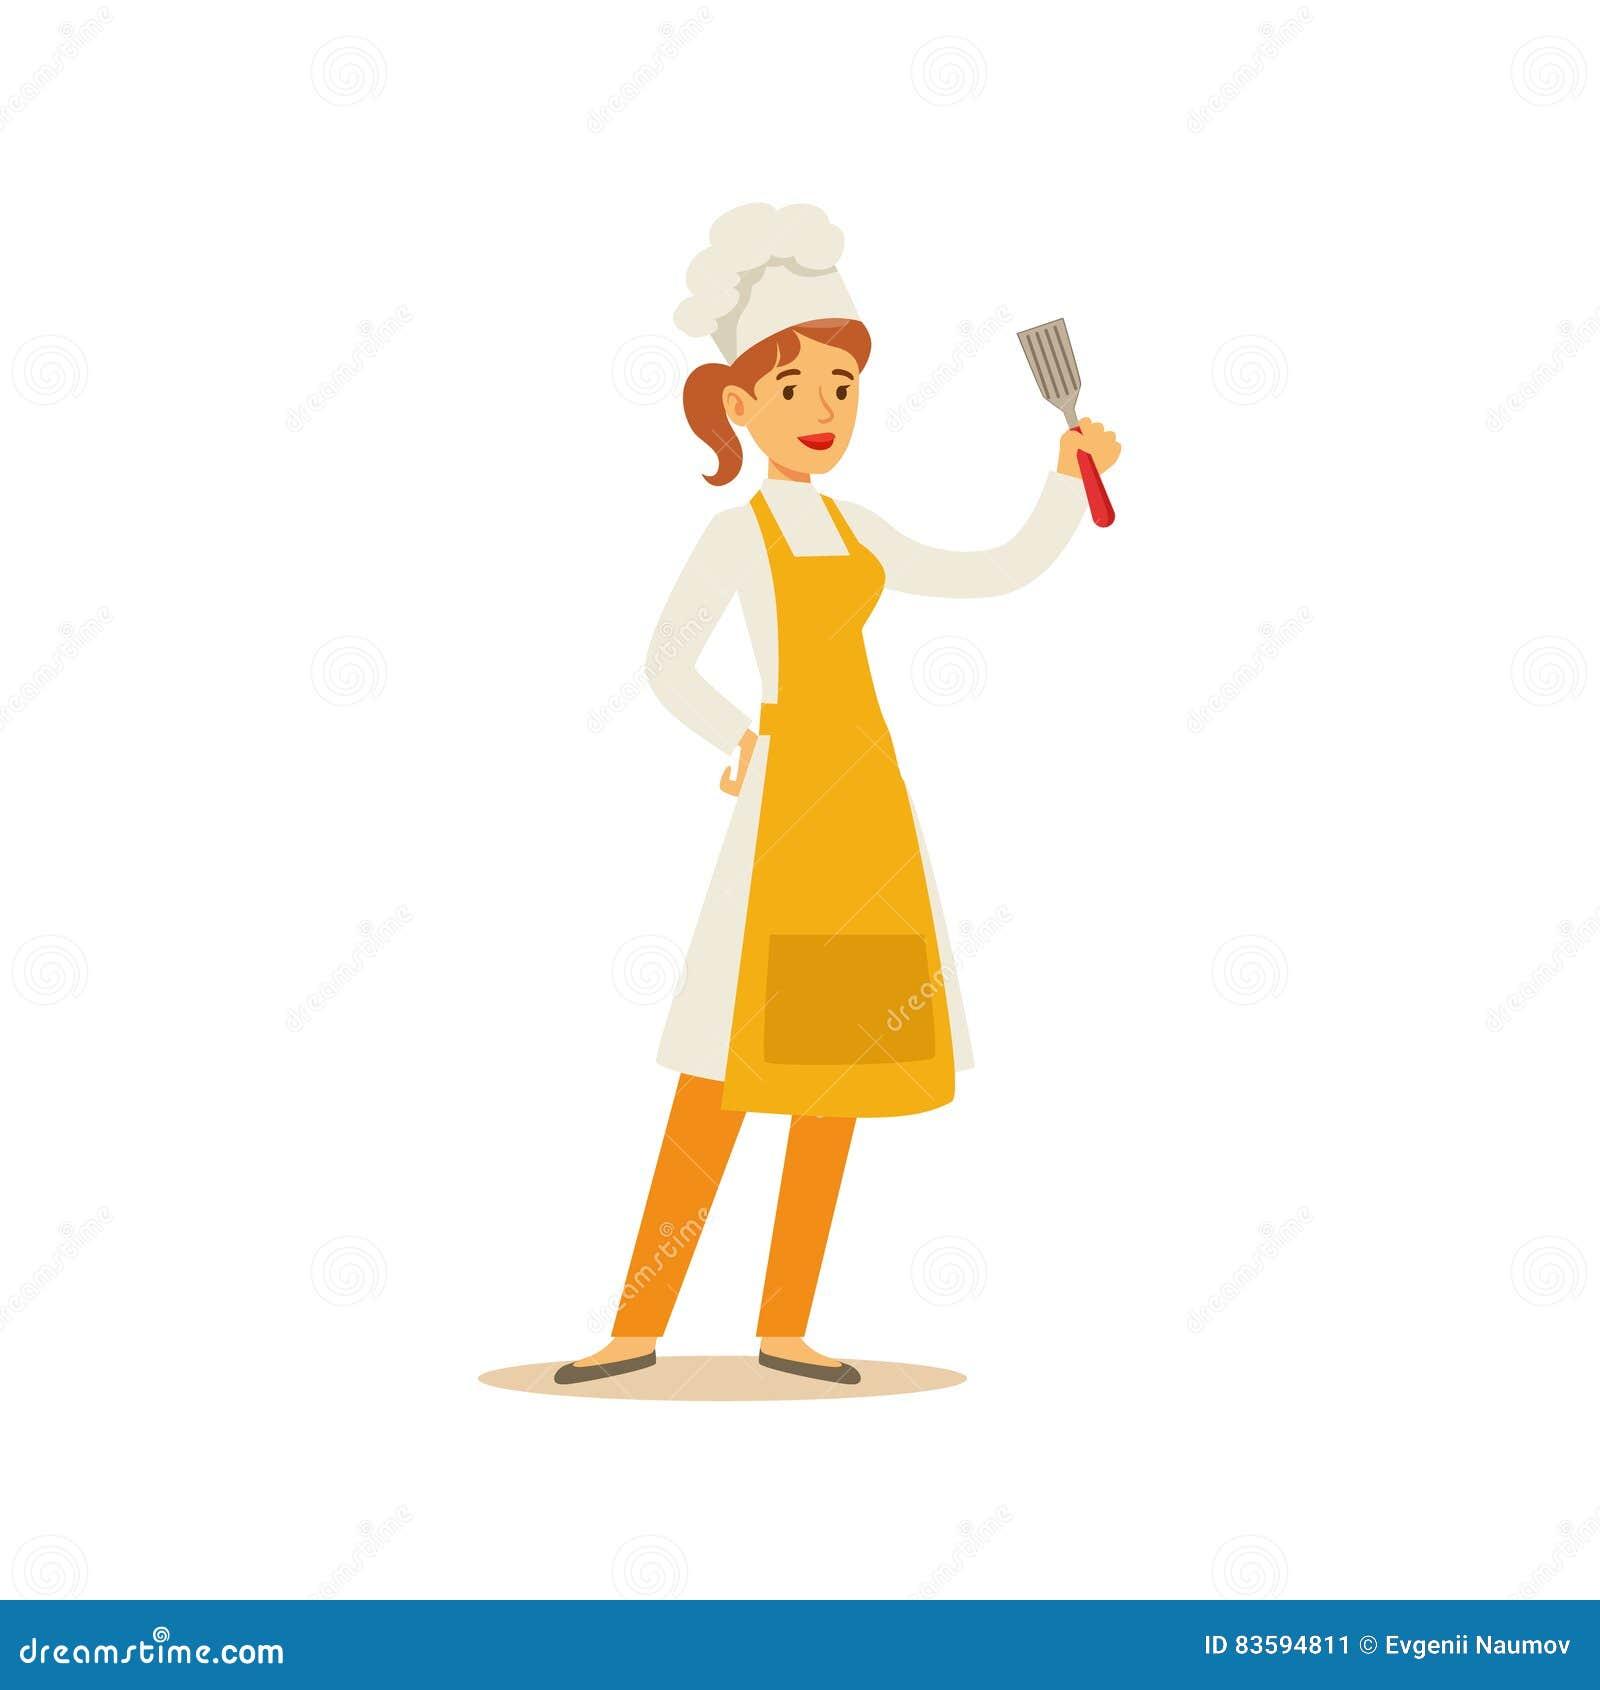 Chef à Cuire Professionnel Working In Restaurant De Femme Portant L